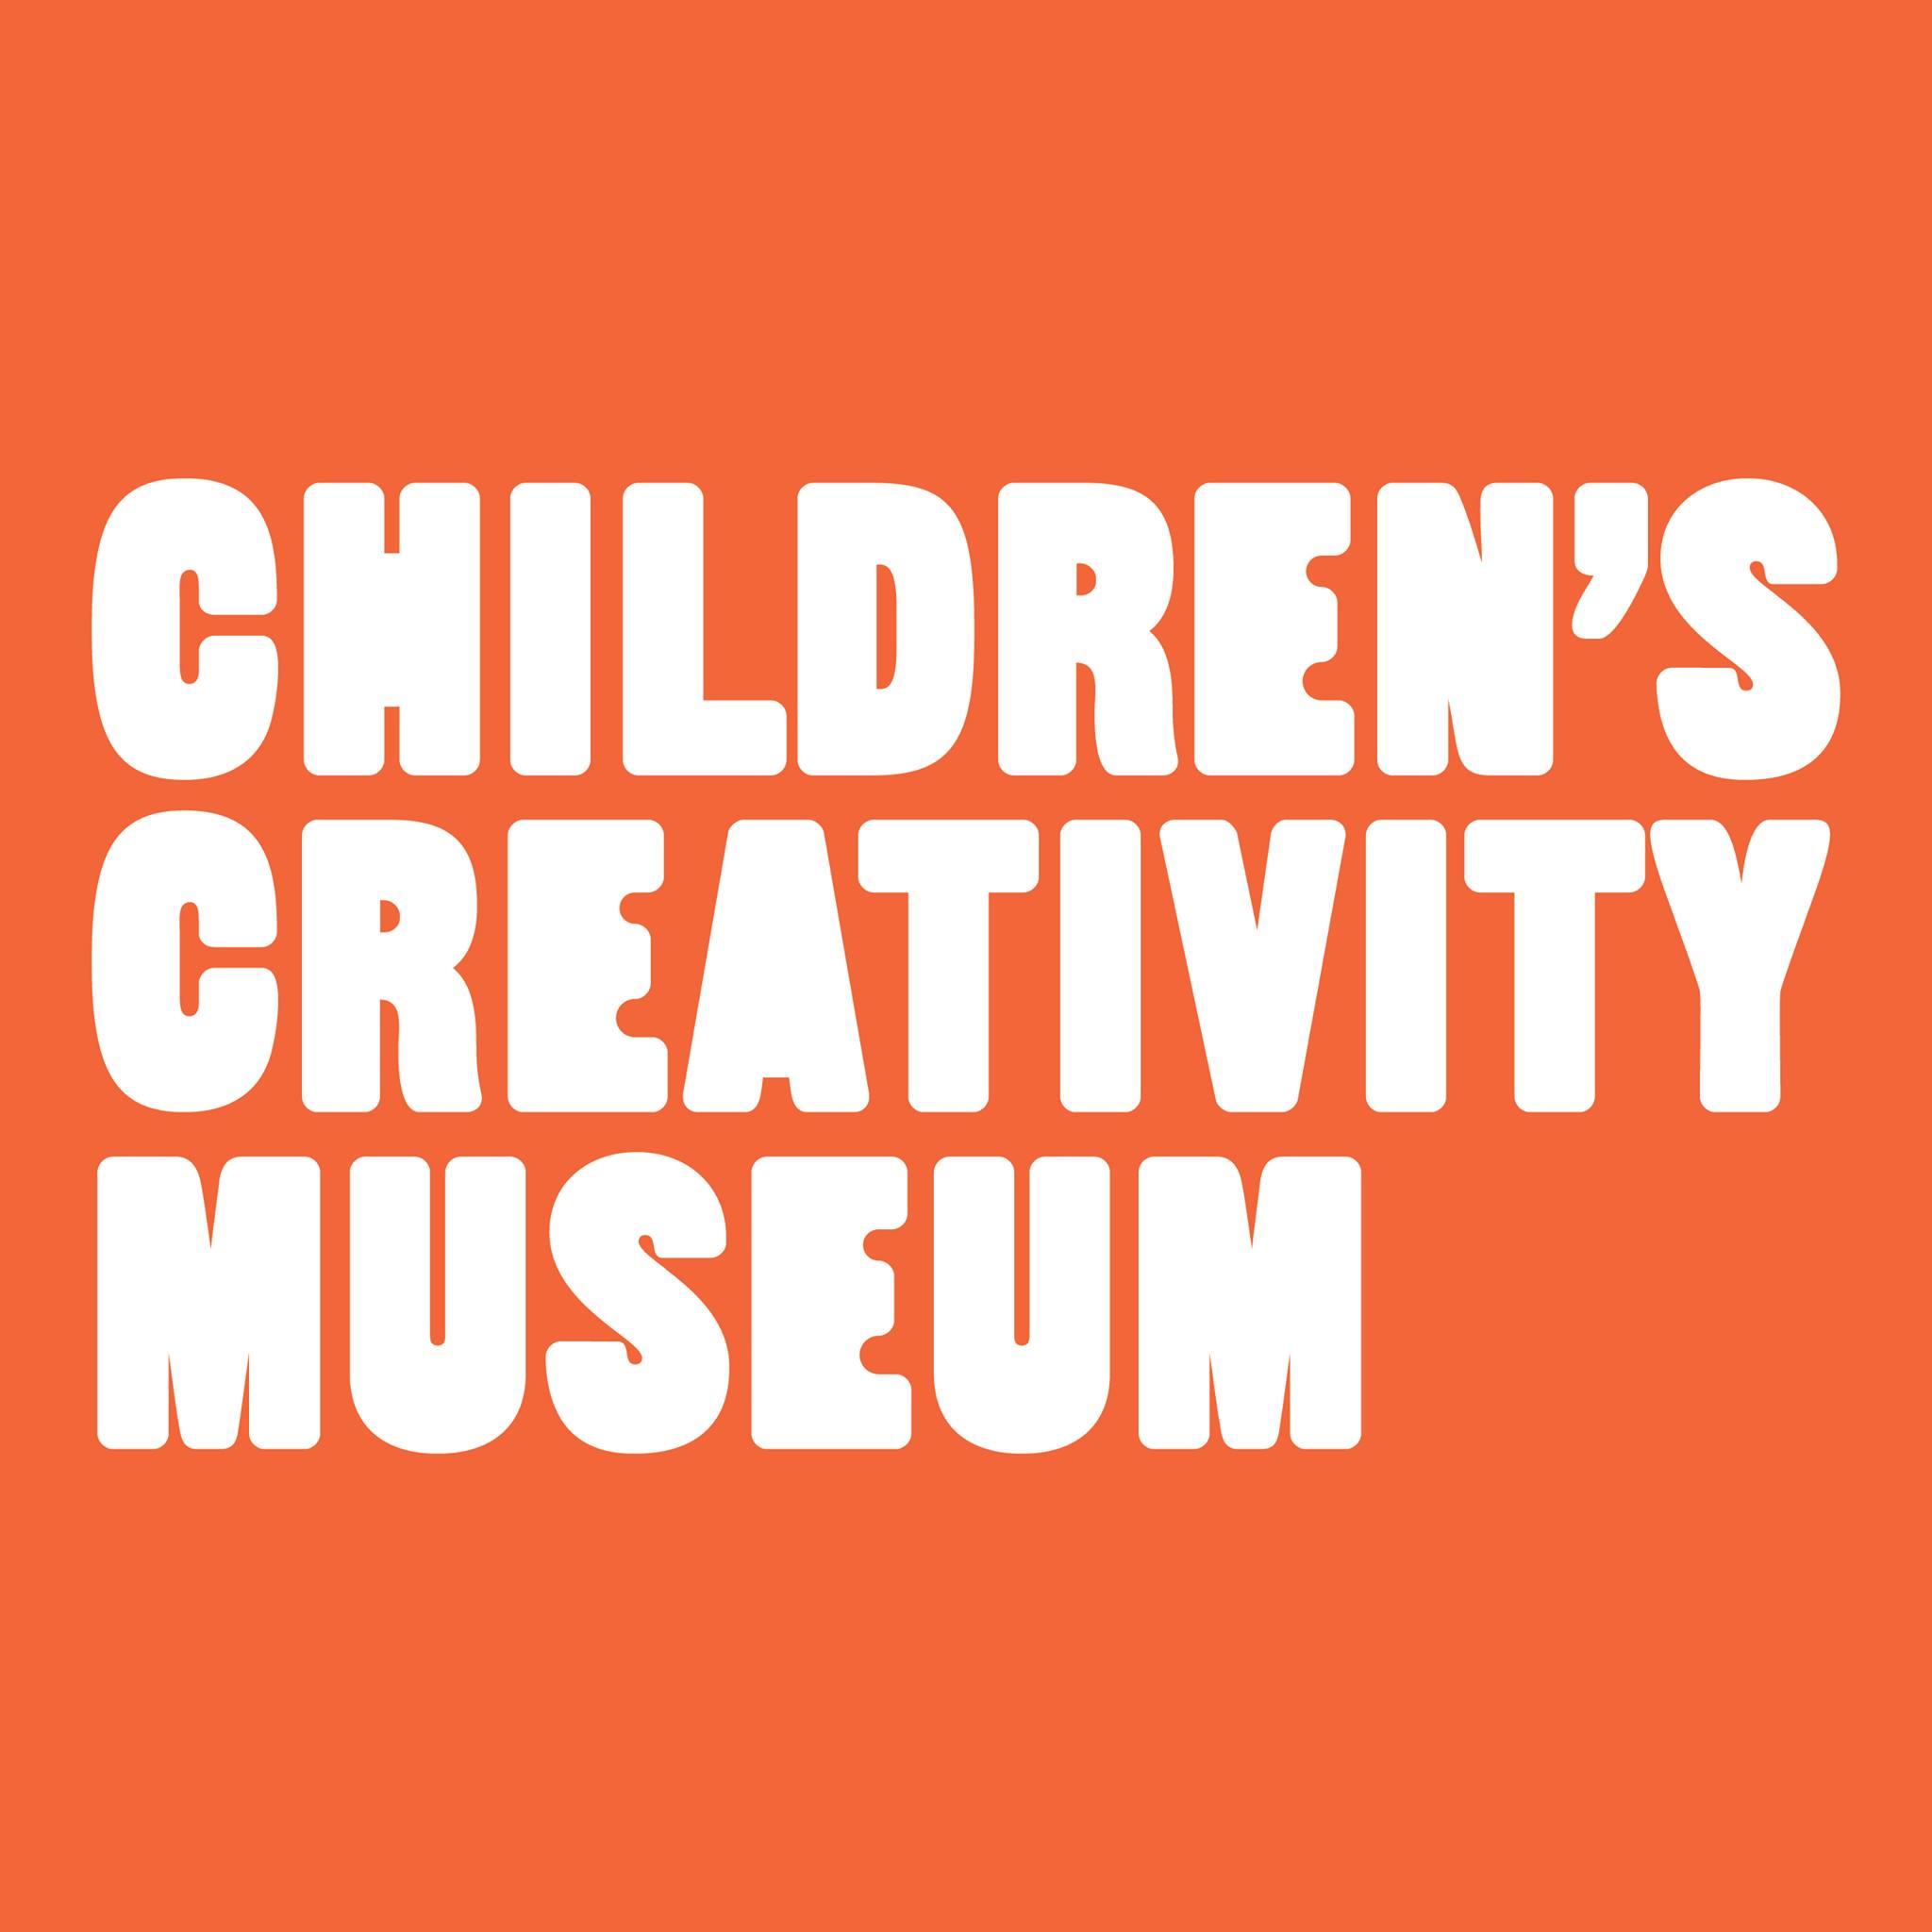 Children's Creativity Museum - Closed September 2-6